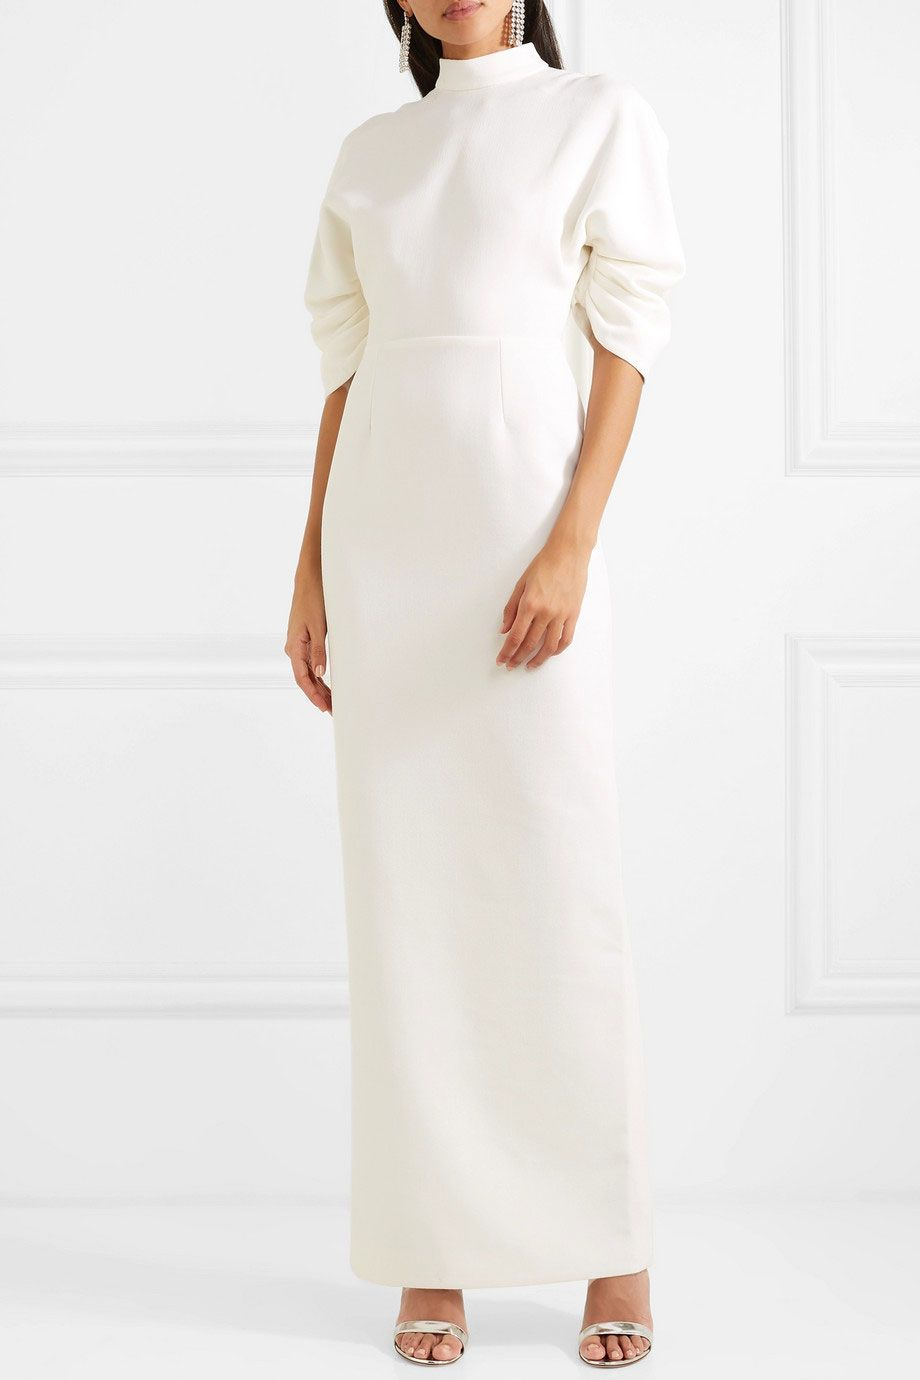 Emilia Wickstead Sharonella Wool-Crepe Dress